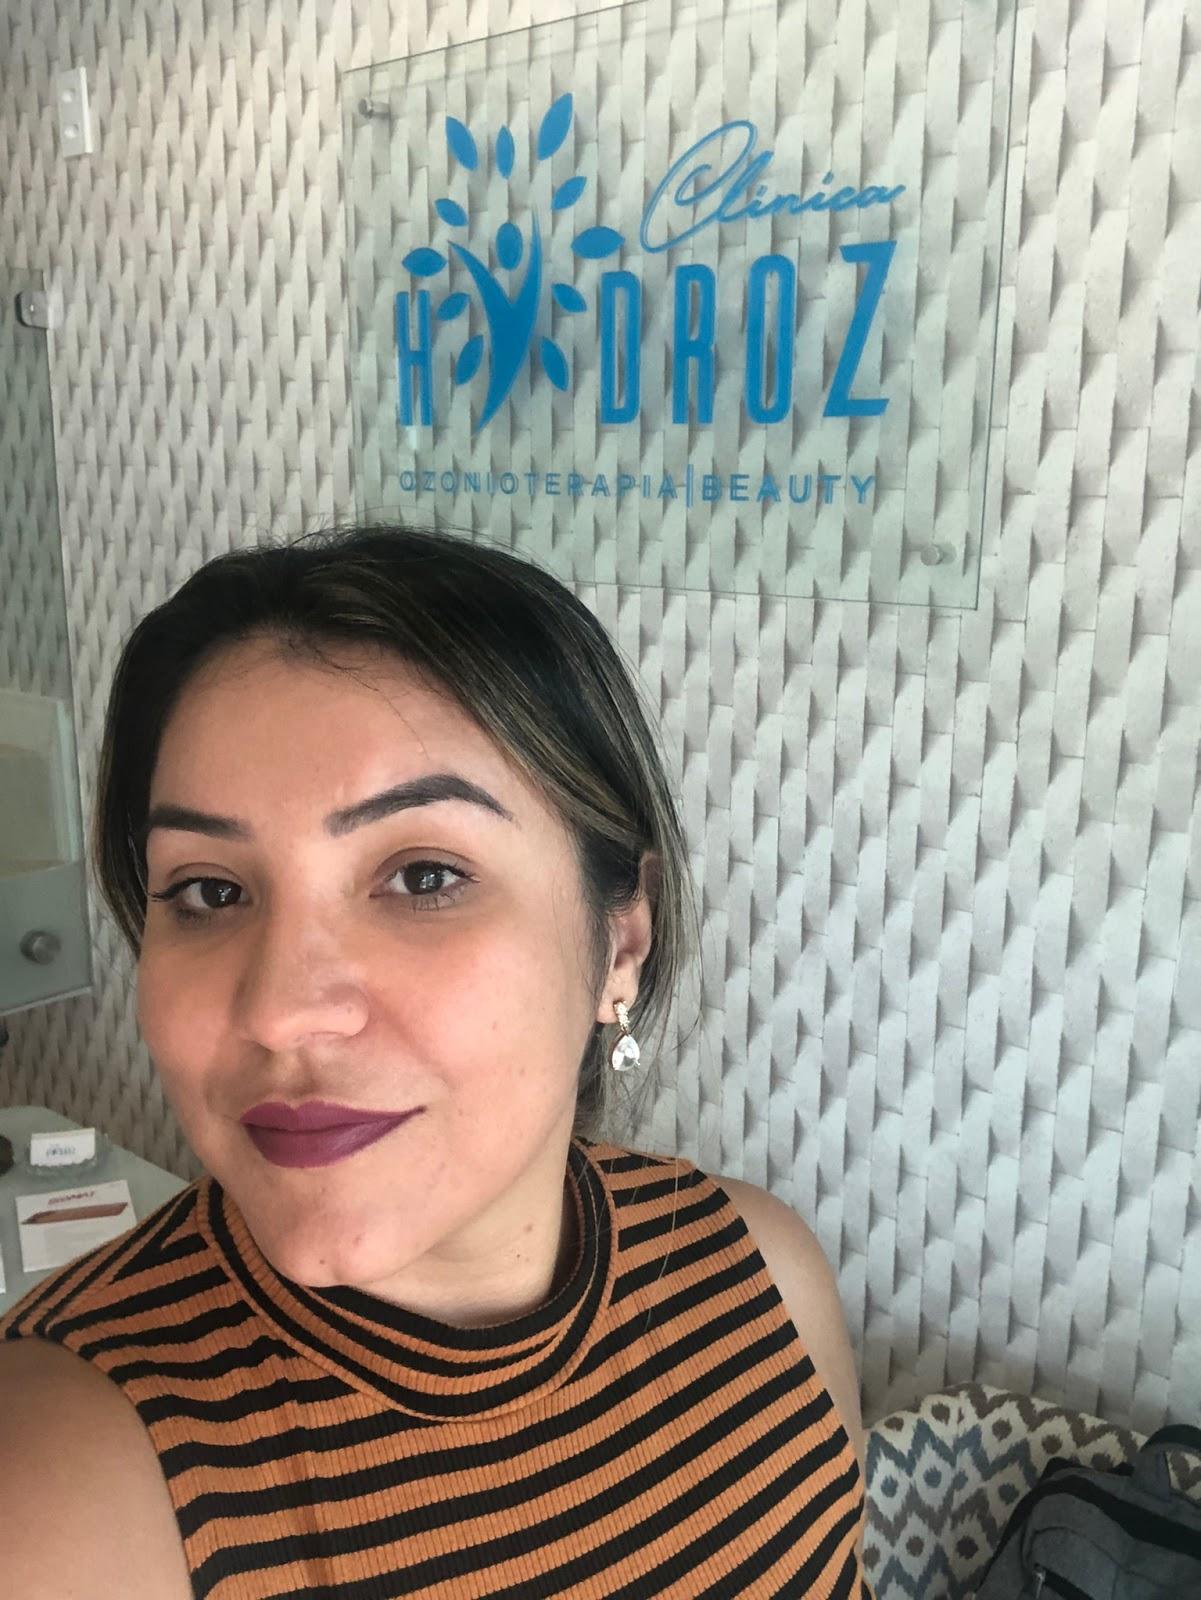 Clínica Hydroz: Ozonioterapia em Águas Claras